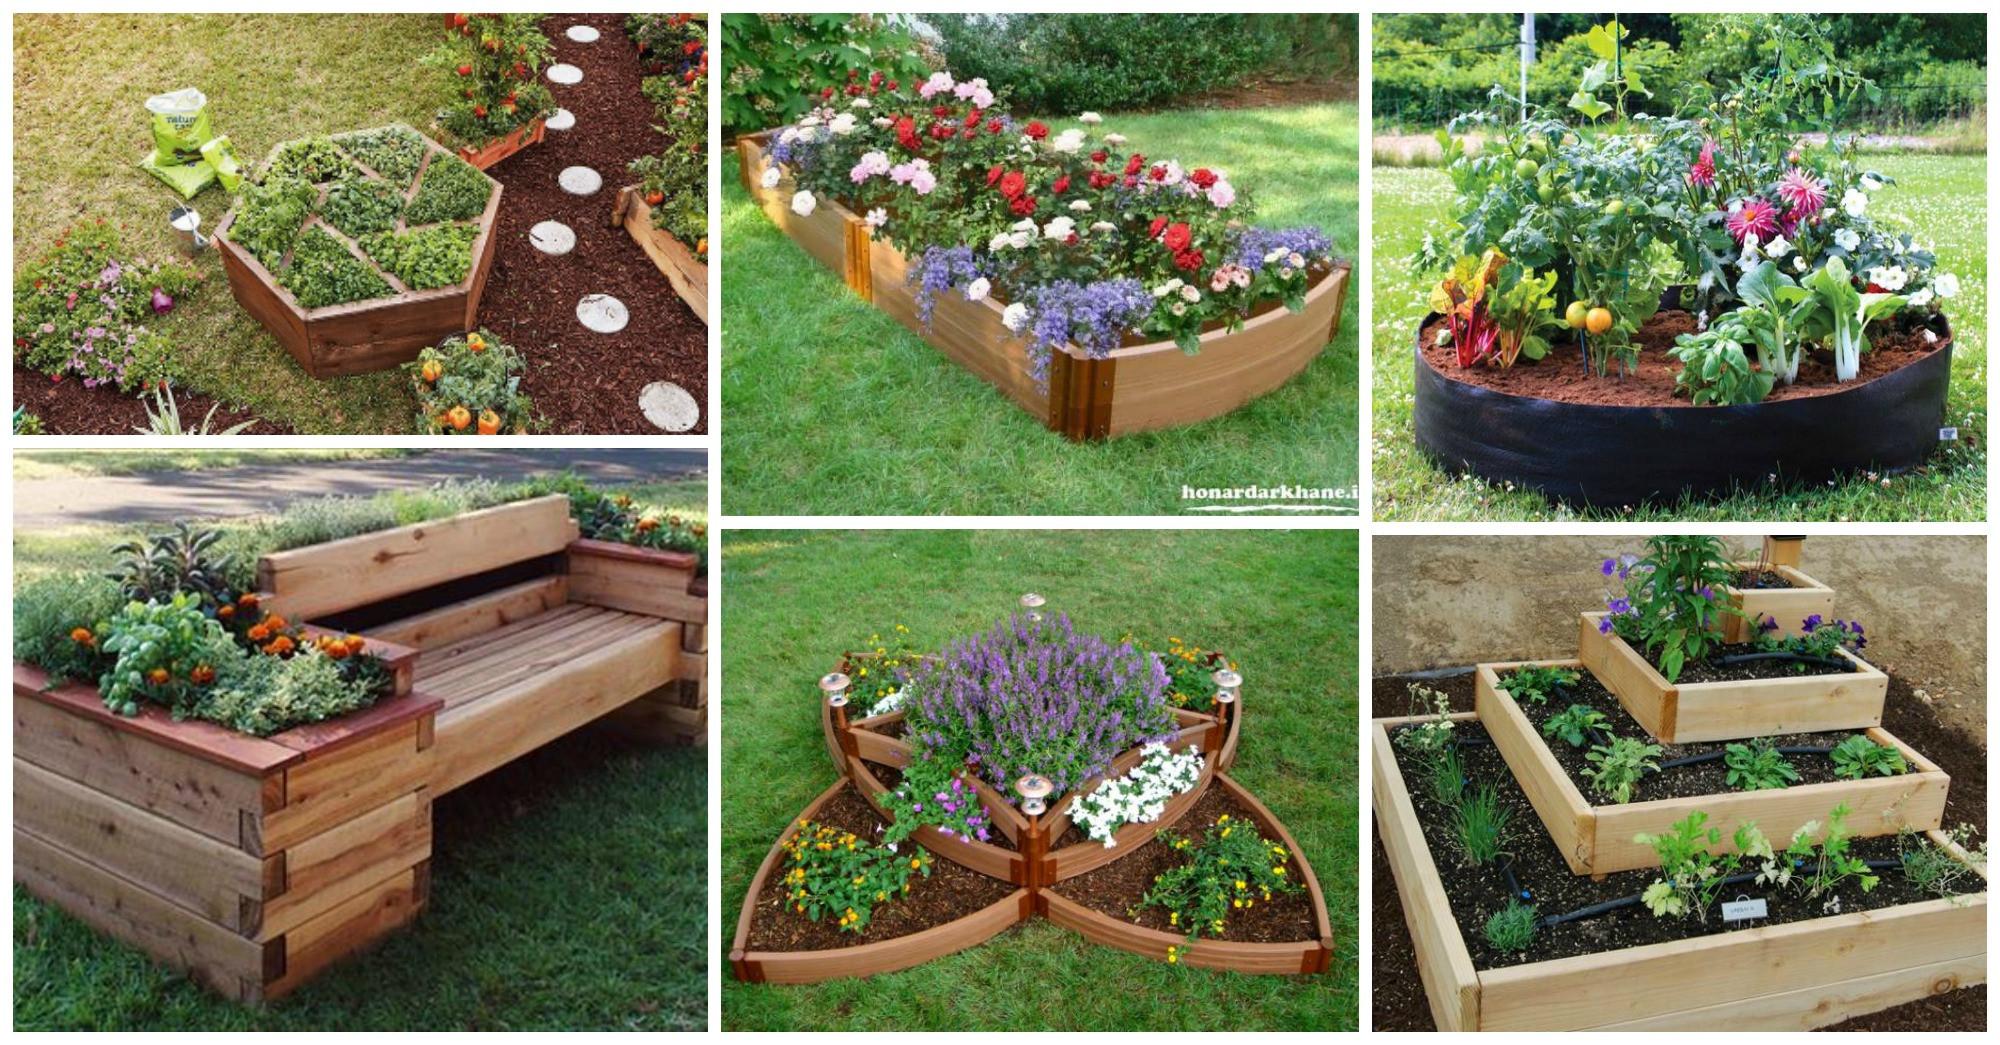 Best ideas about DIY Flower Garden . Save or Pin Impressive DIY Flower Beds That Will Decorate Your Garden Now.